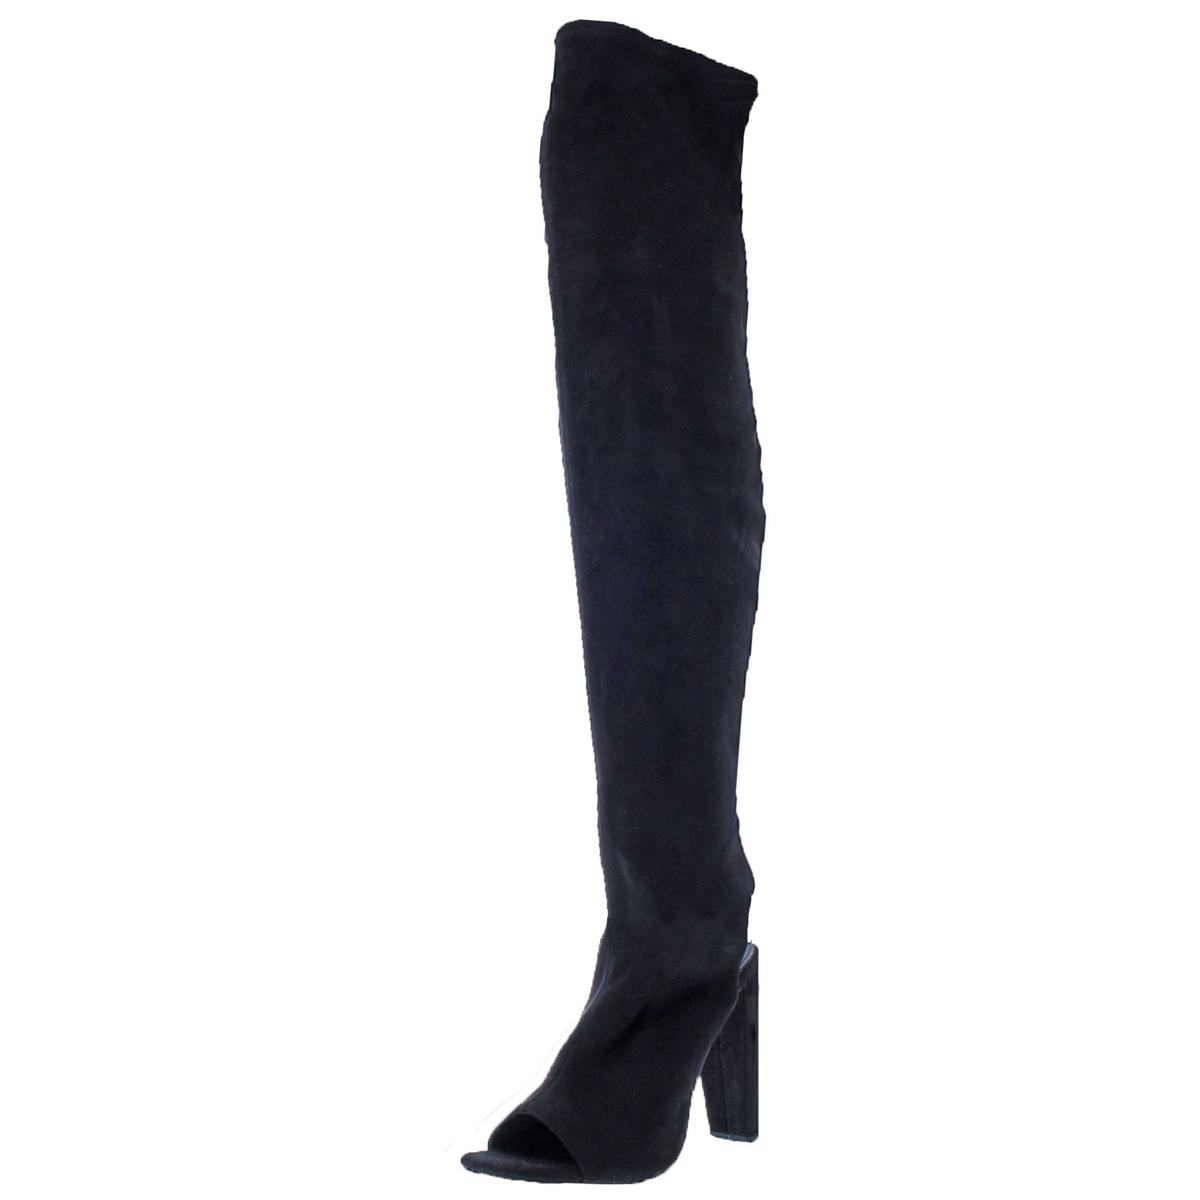 Steve Madden Para Mujer Kimmi Negro Sobre La Rodilla Rodilla Rodilla botas 8 Medio (B, M) BHFO 6604  precio al por mayor